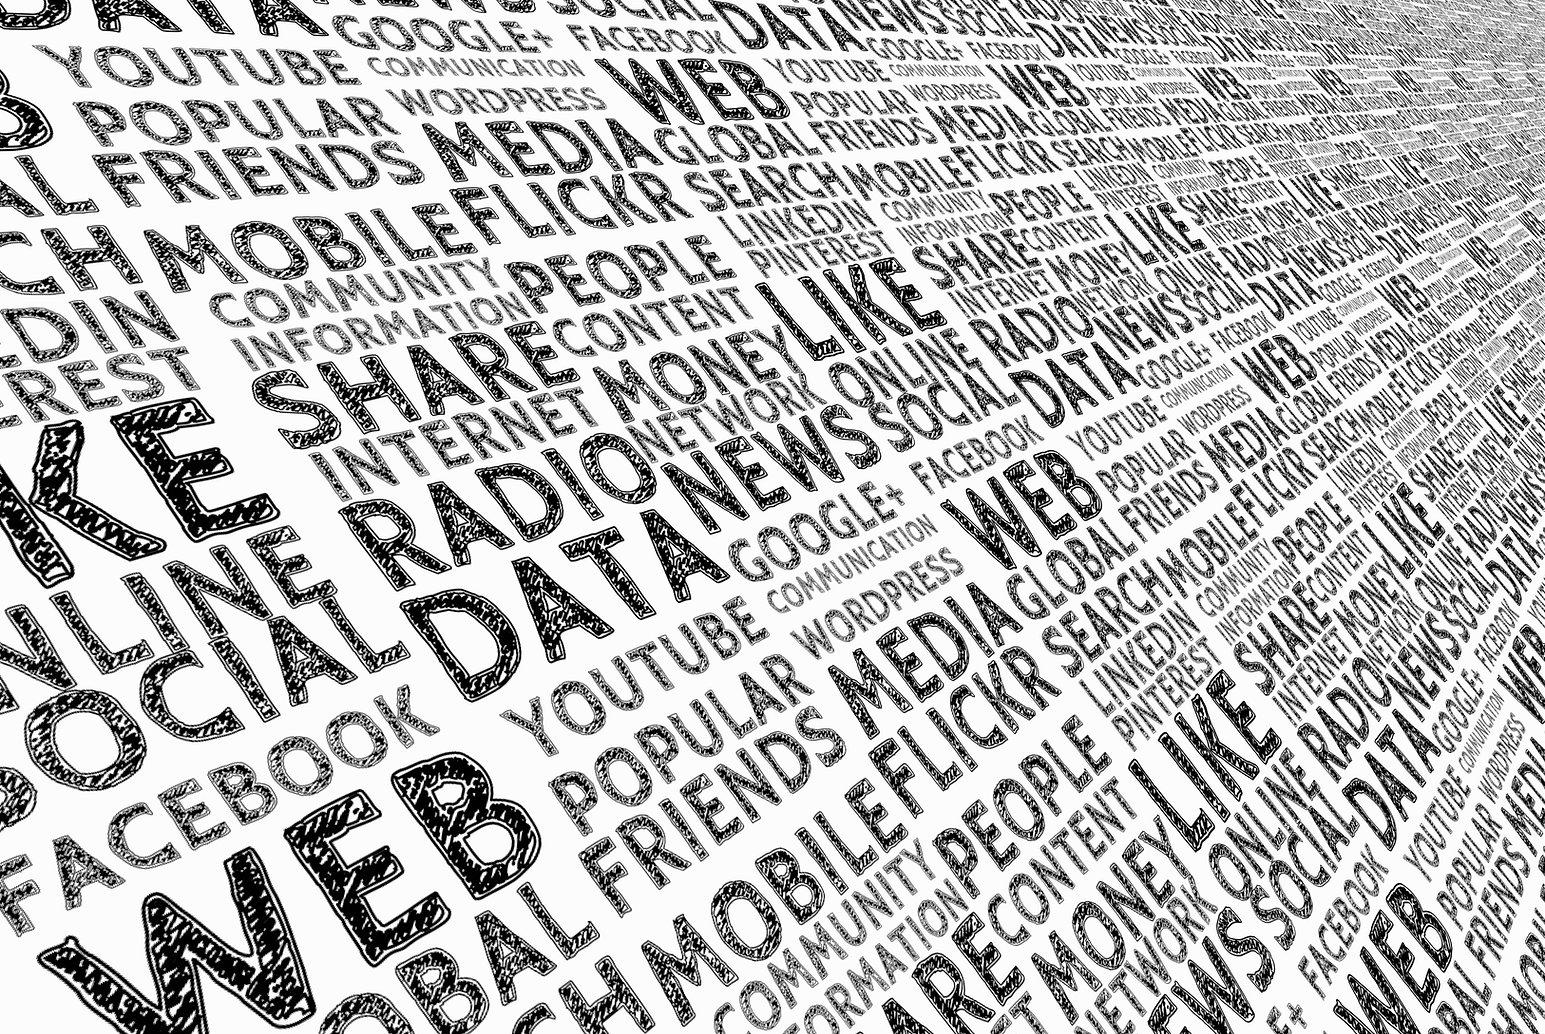 Stratégie de communication digitale globale